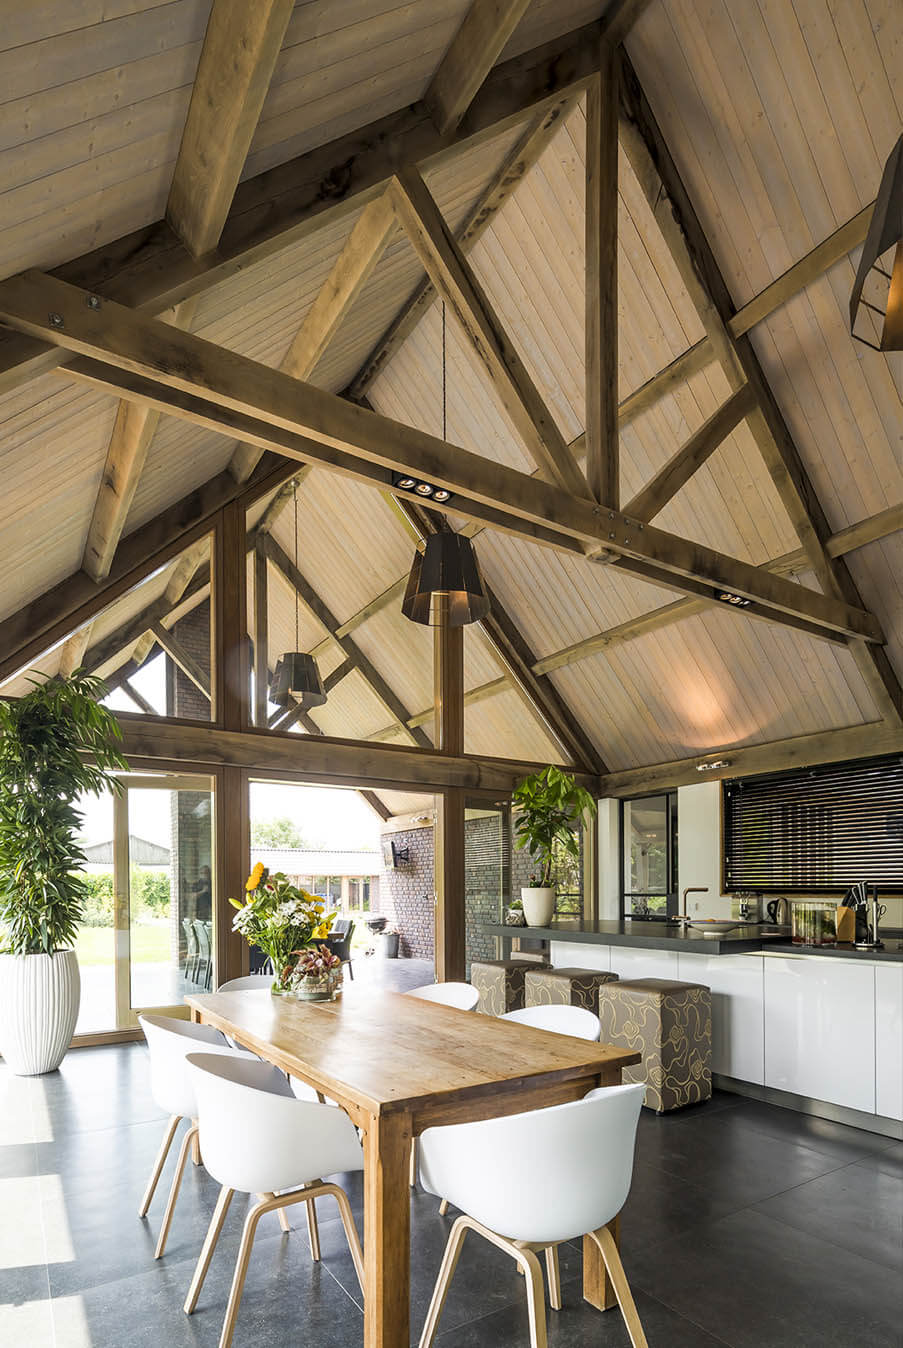 Eikenhouten dakconstructie Keuken inspiratie 3 Houthandel Looijmans